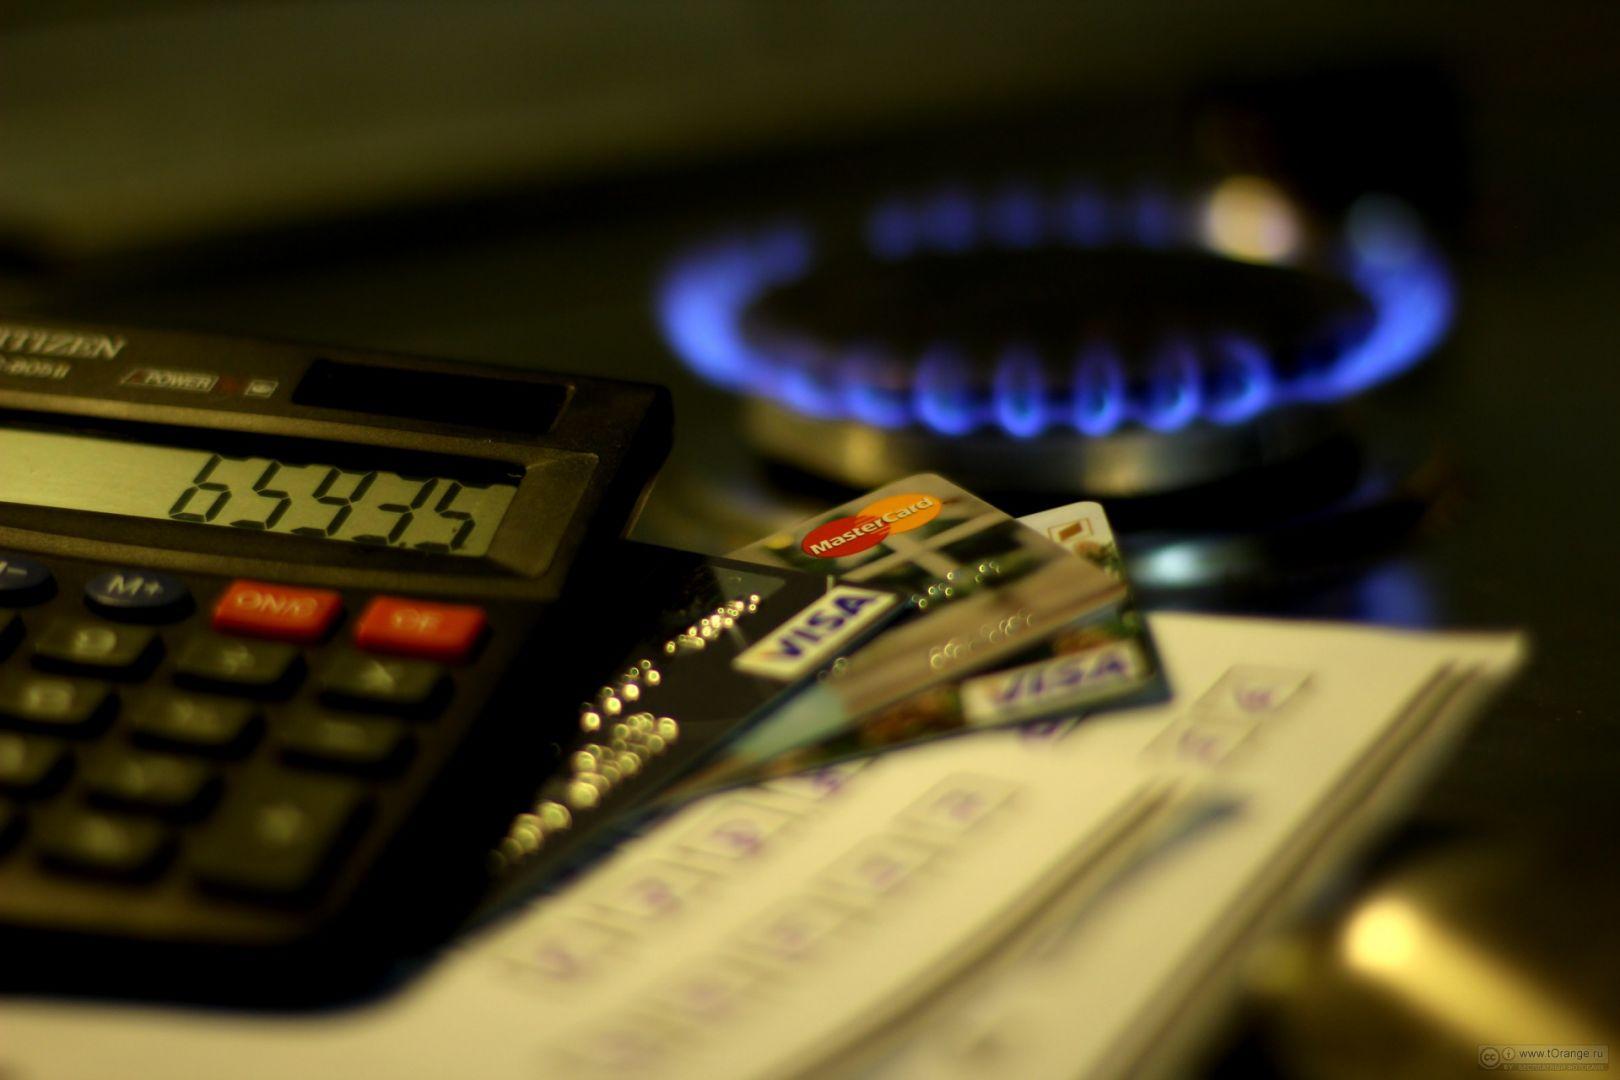 Сумма долга за газ на Ставрополье сокращена на 600 миллионов рублей